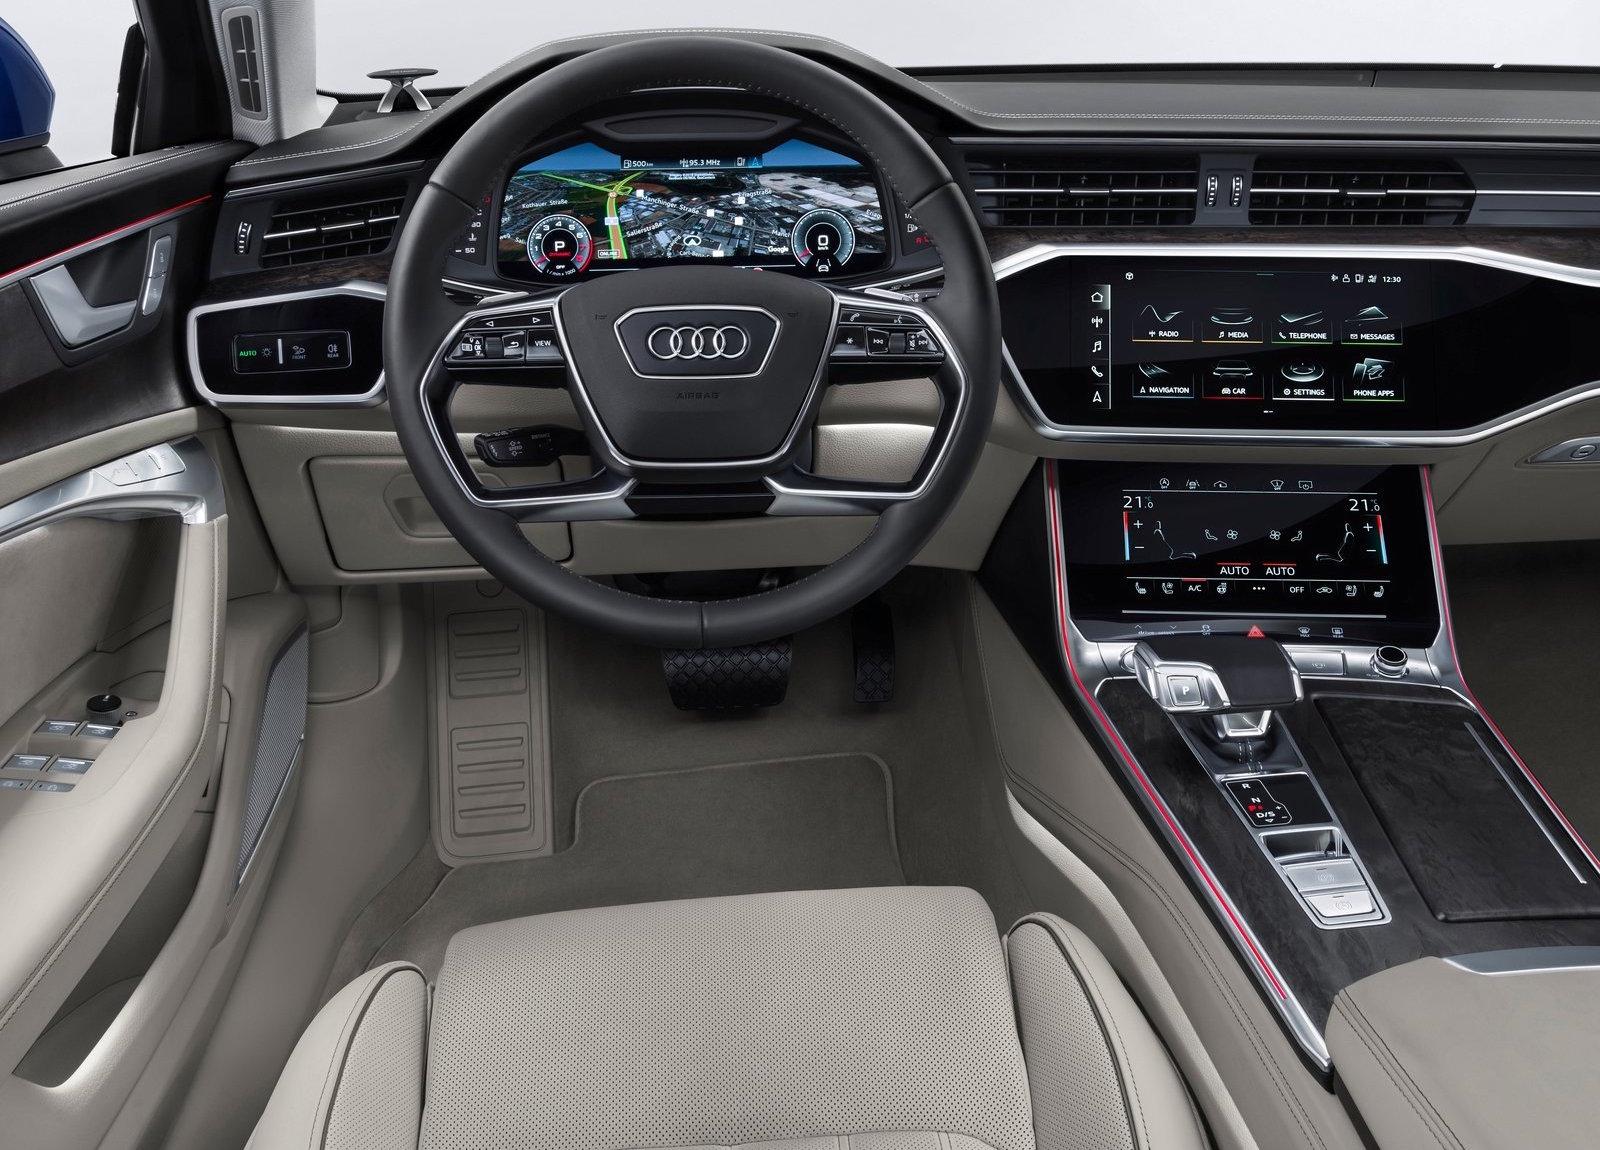 2019 Audi A6 Avant Revealed Under Evaluation For